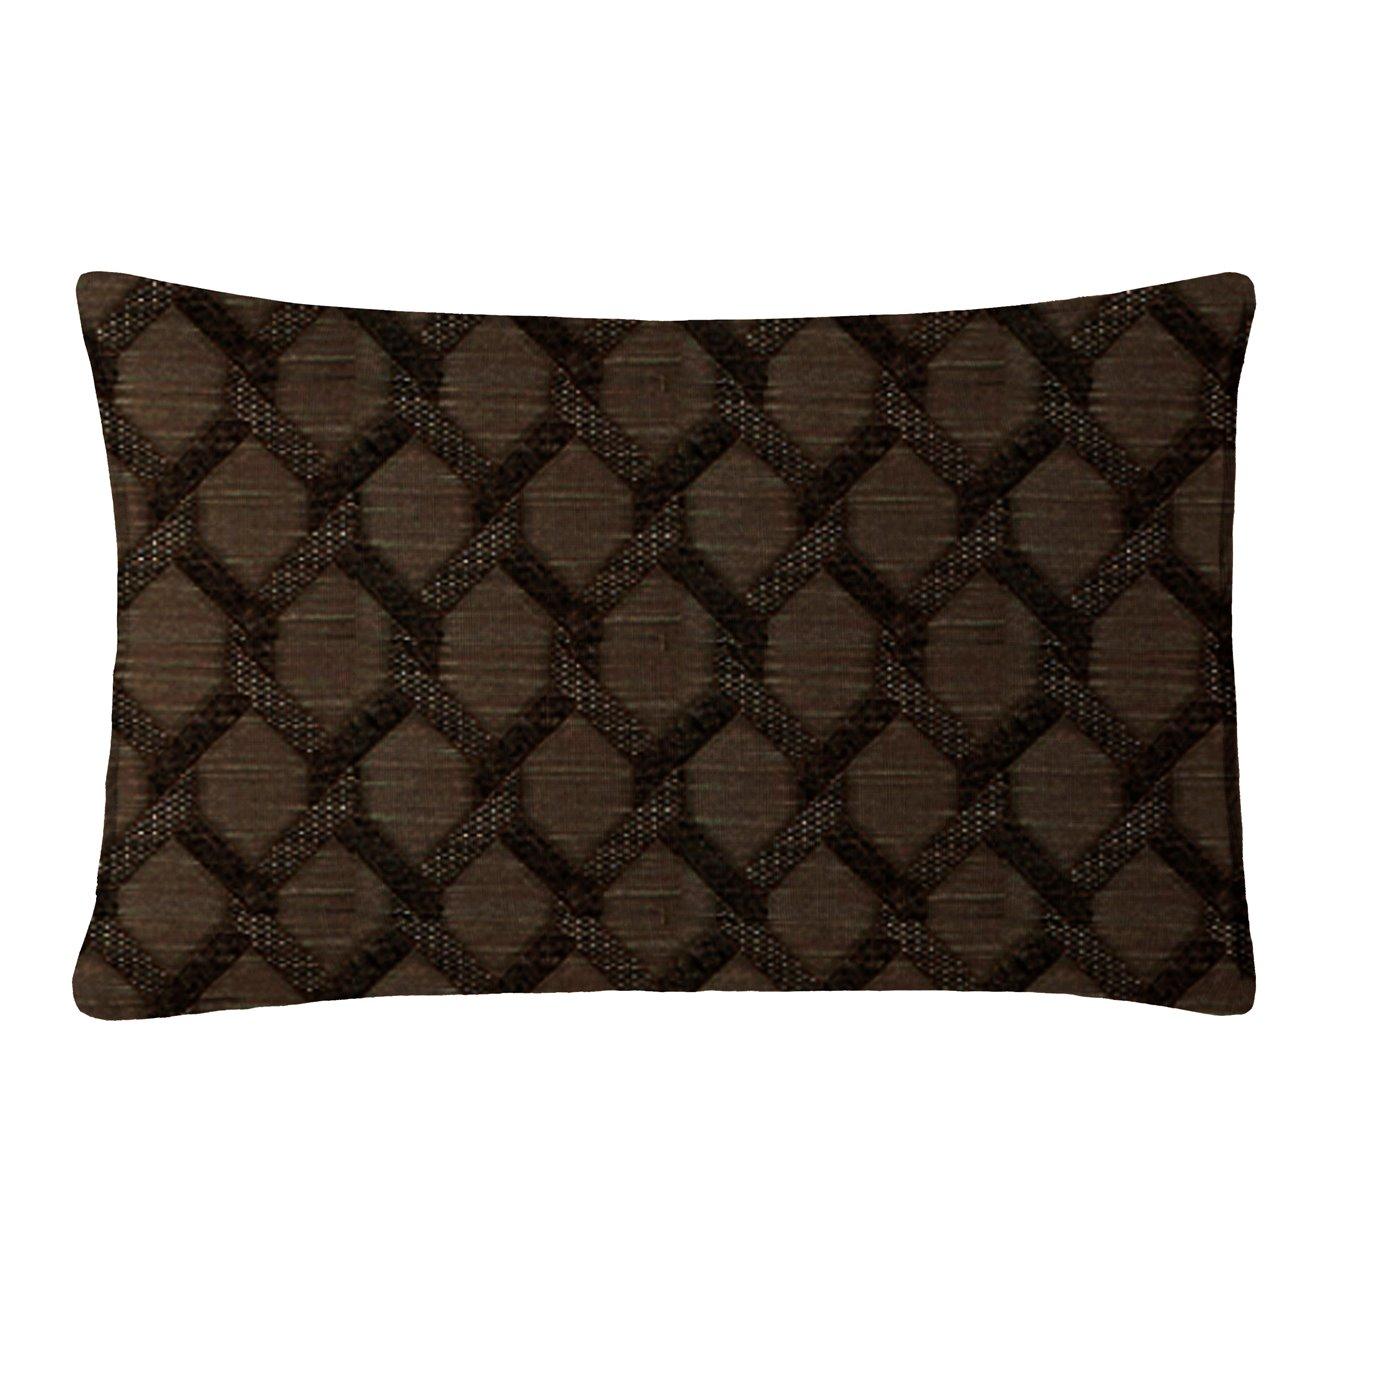 "Malden Chocolate Rectangle Pillow 14""x22"""